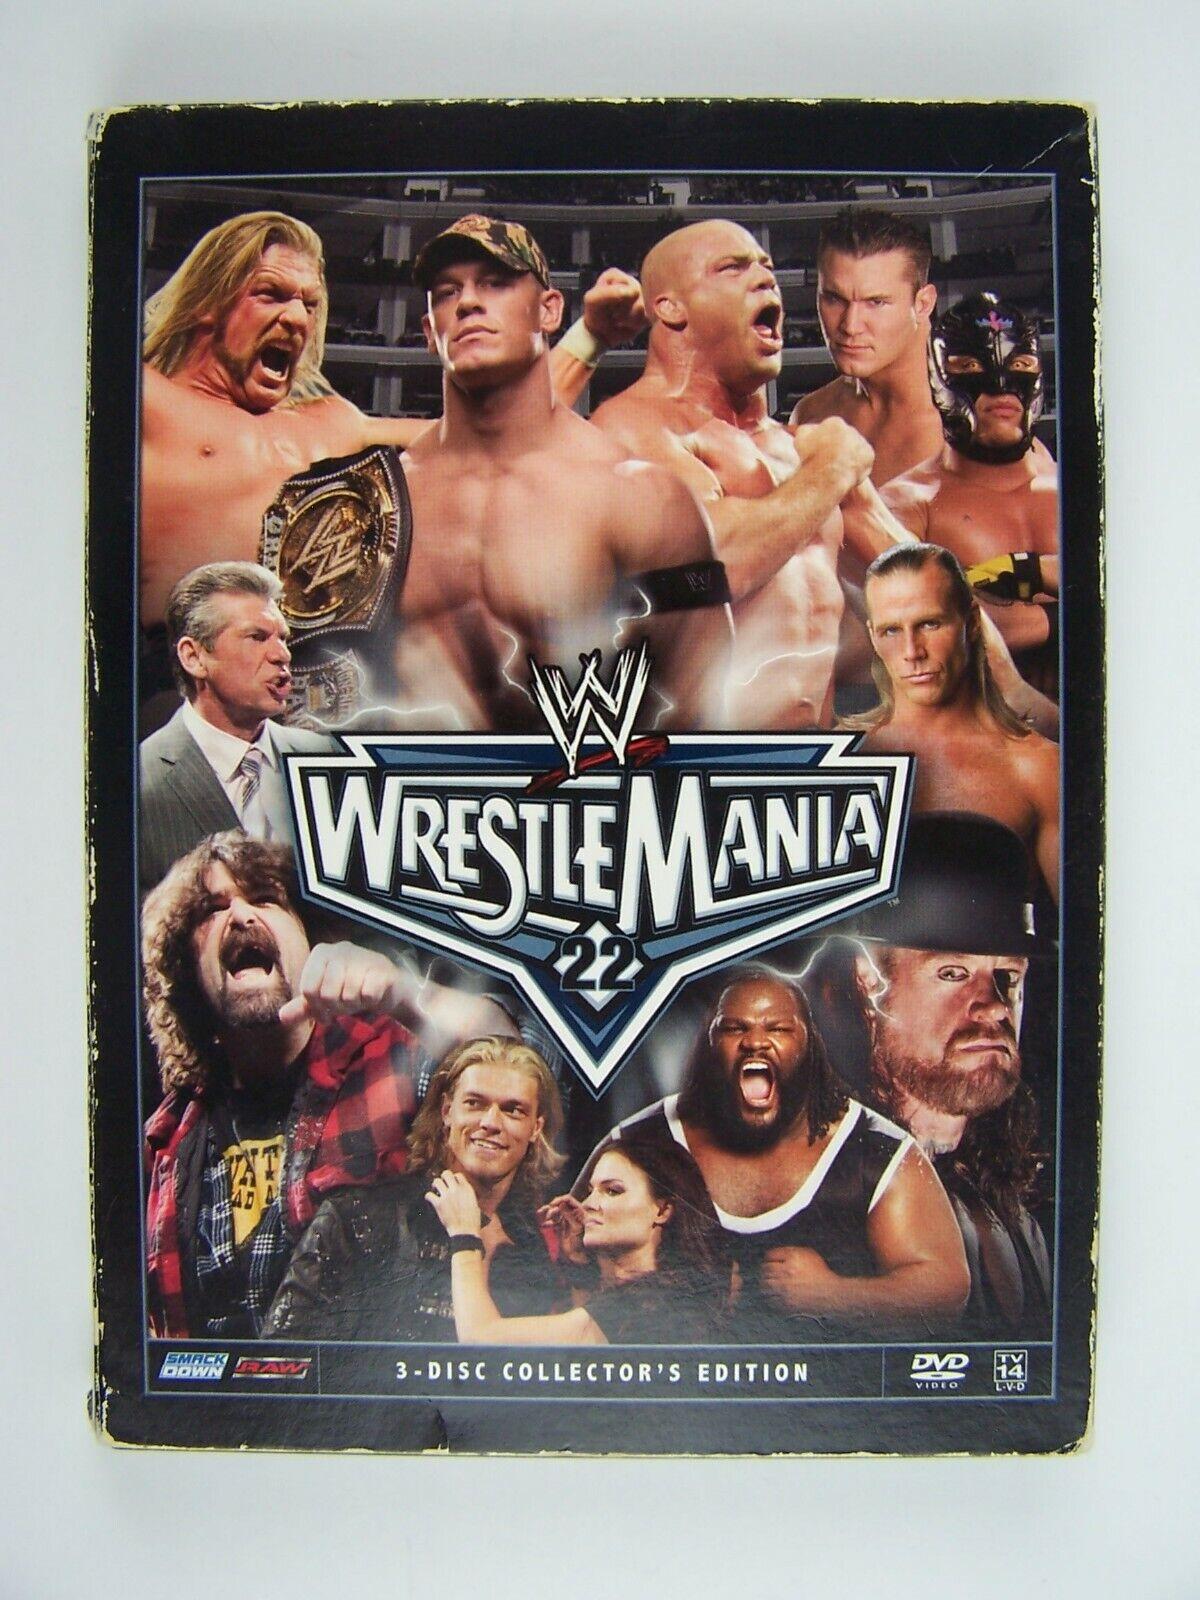 WWE: WrestleMania 22 Collector's Edition 3xDVD Box Set